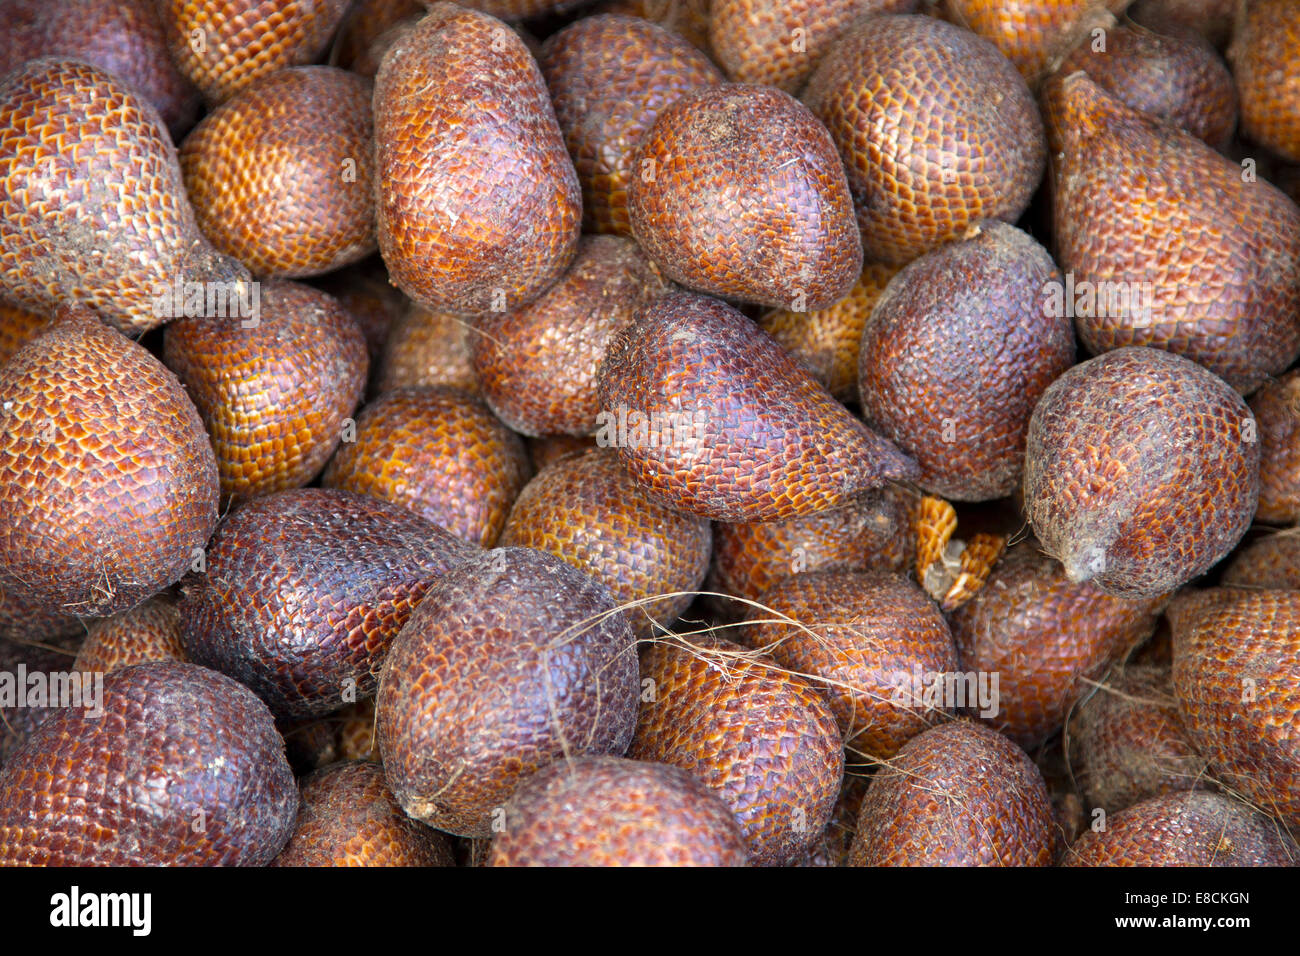 Salak or snake fruit - Stock Image